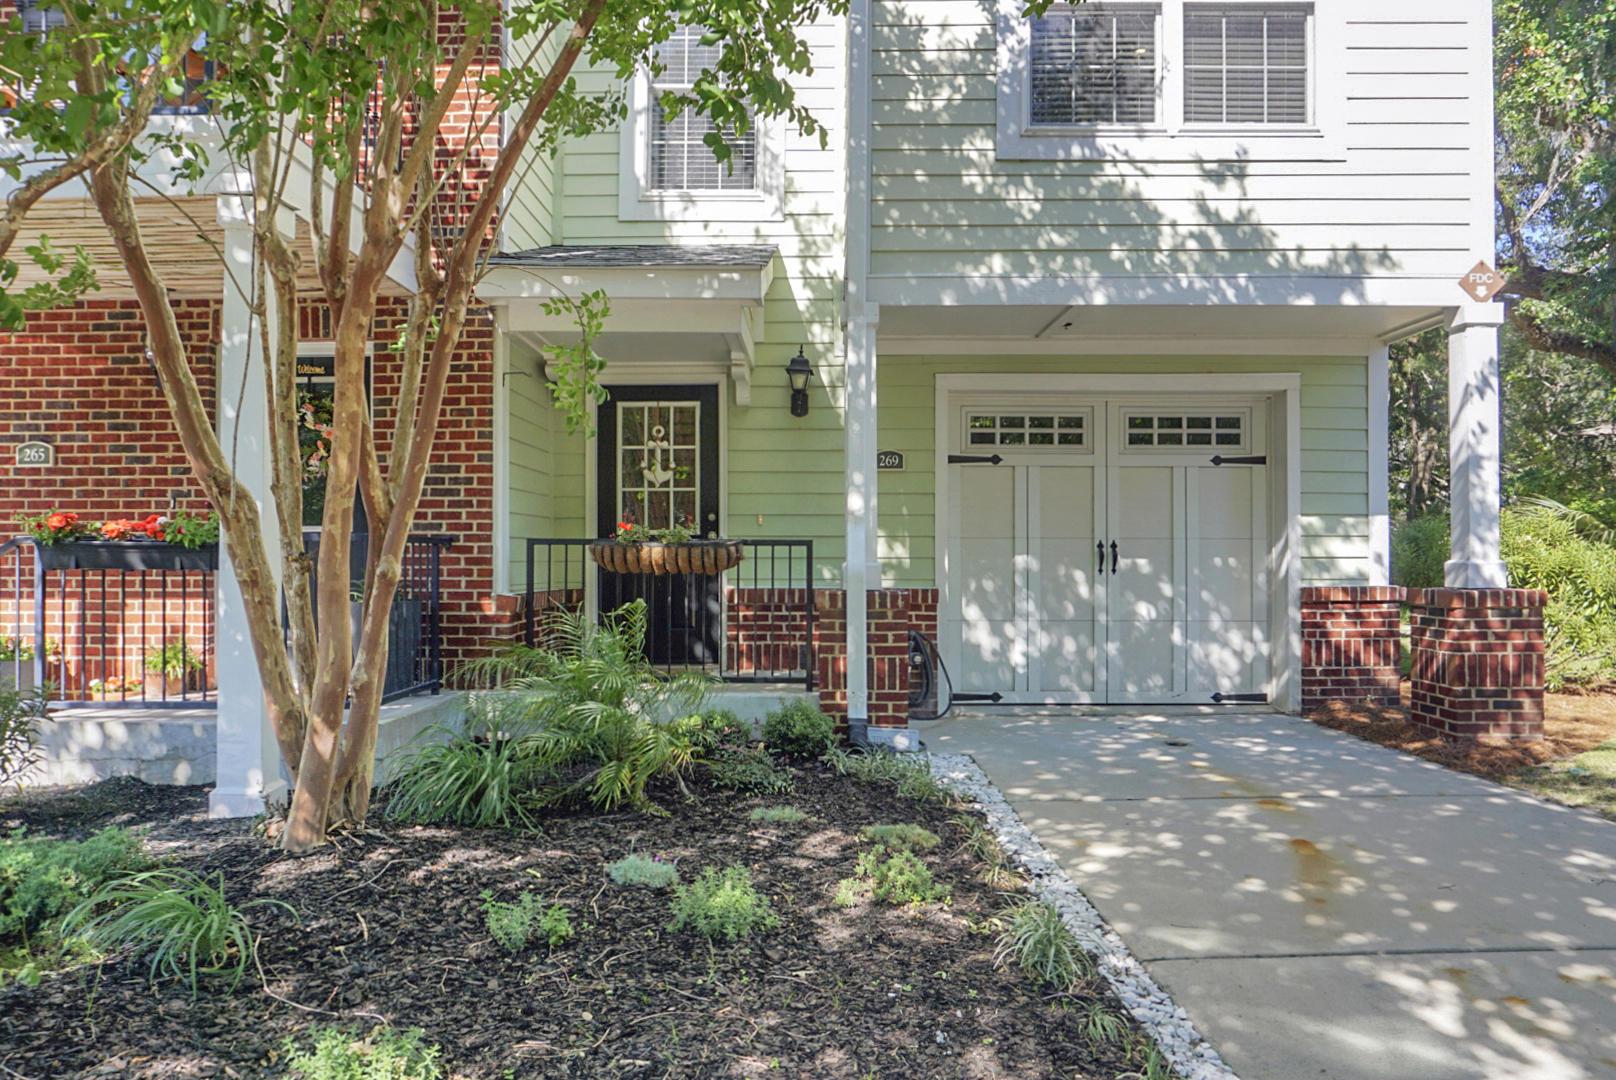 Etiwan Pointe Homes For Sale - 269 Etiwan Pointe, Mount Pleasant, SC - 4